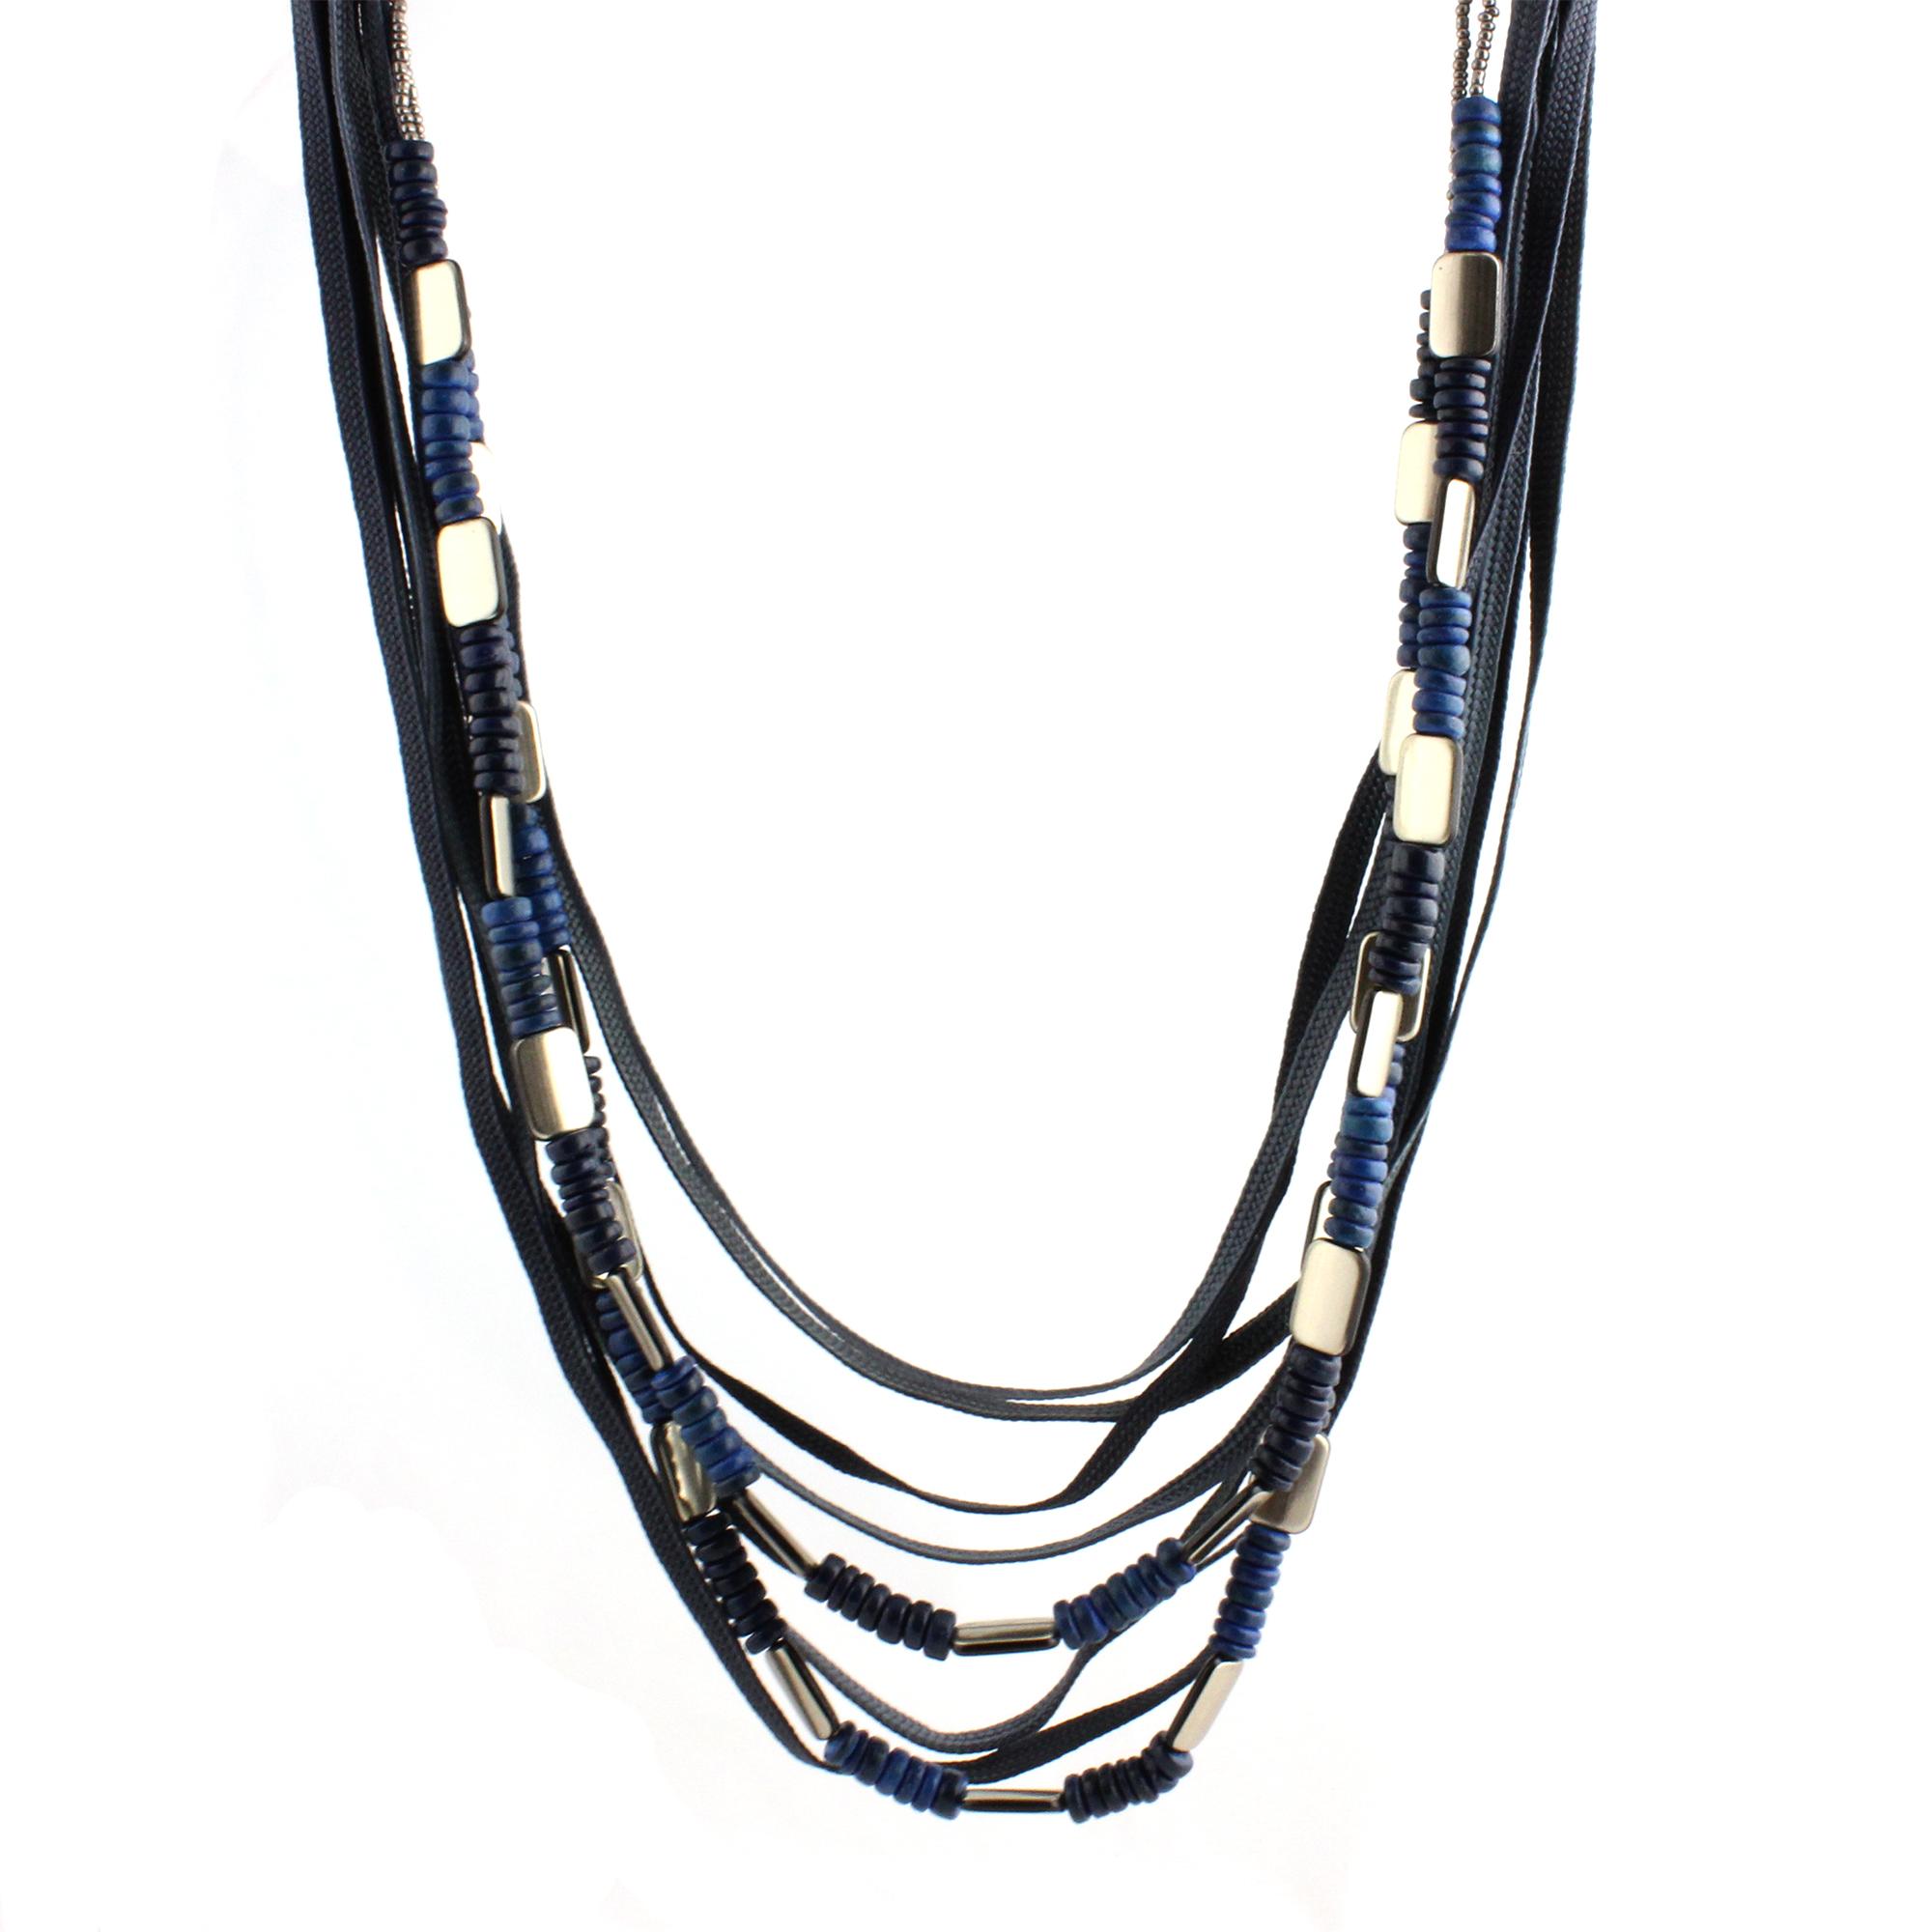 Black Mulit Strand Long Fashion Necklace Polyester, Seed Beads, Wood & Zinc 36